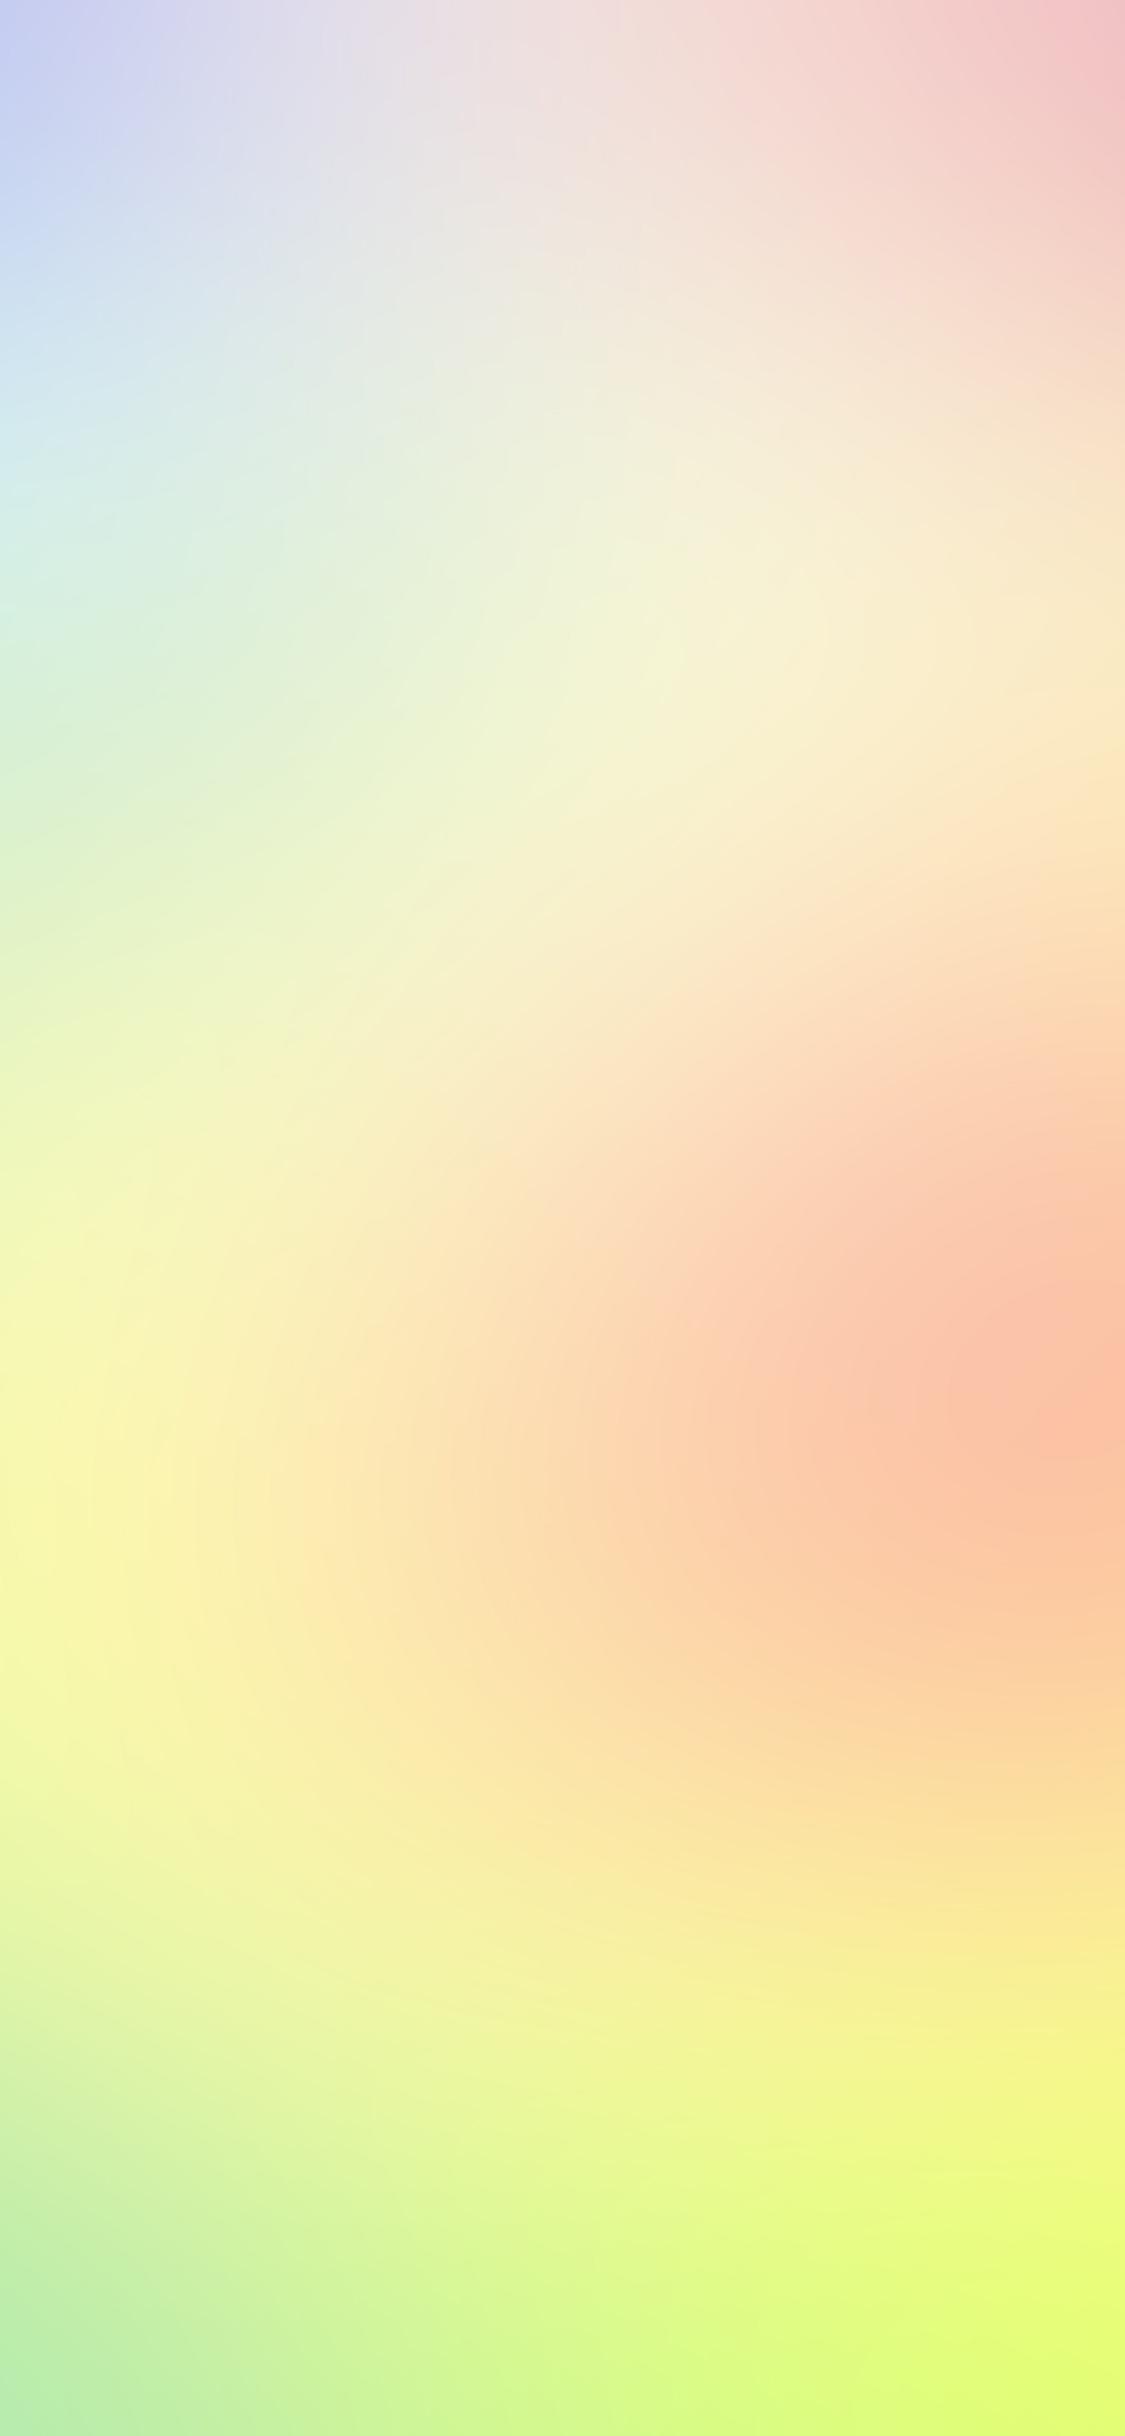 iPhoneXpapers.com-Apple-iPhone-wallpaper-sl40-yellow-spring-blur-gradation